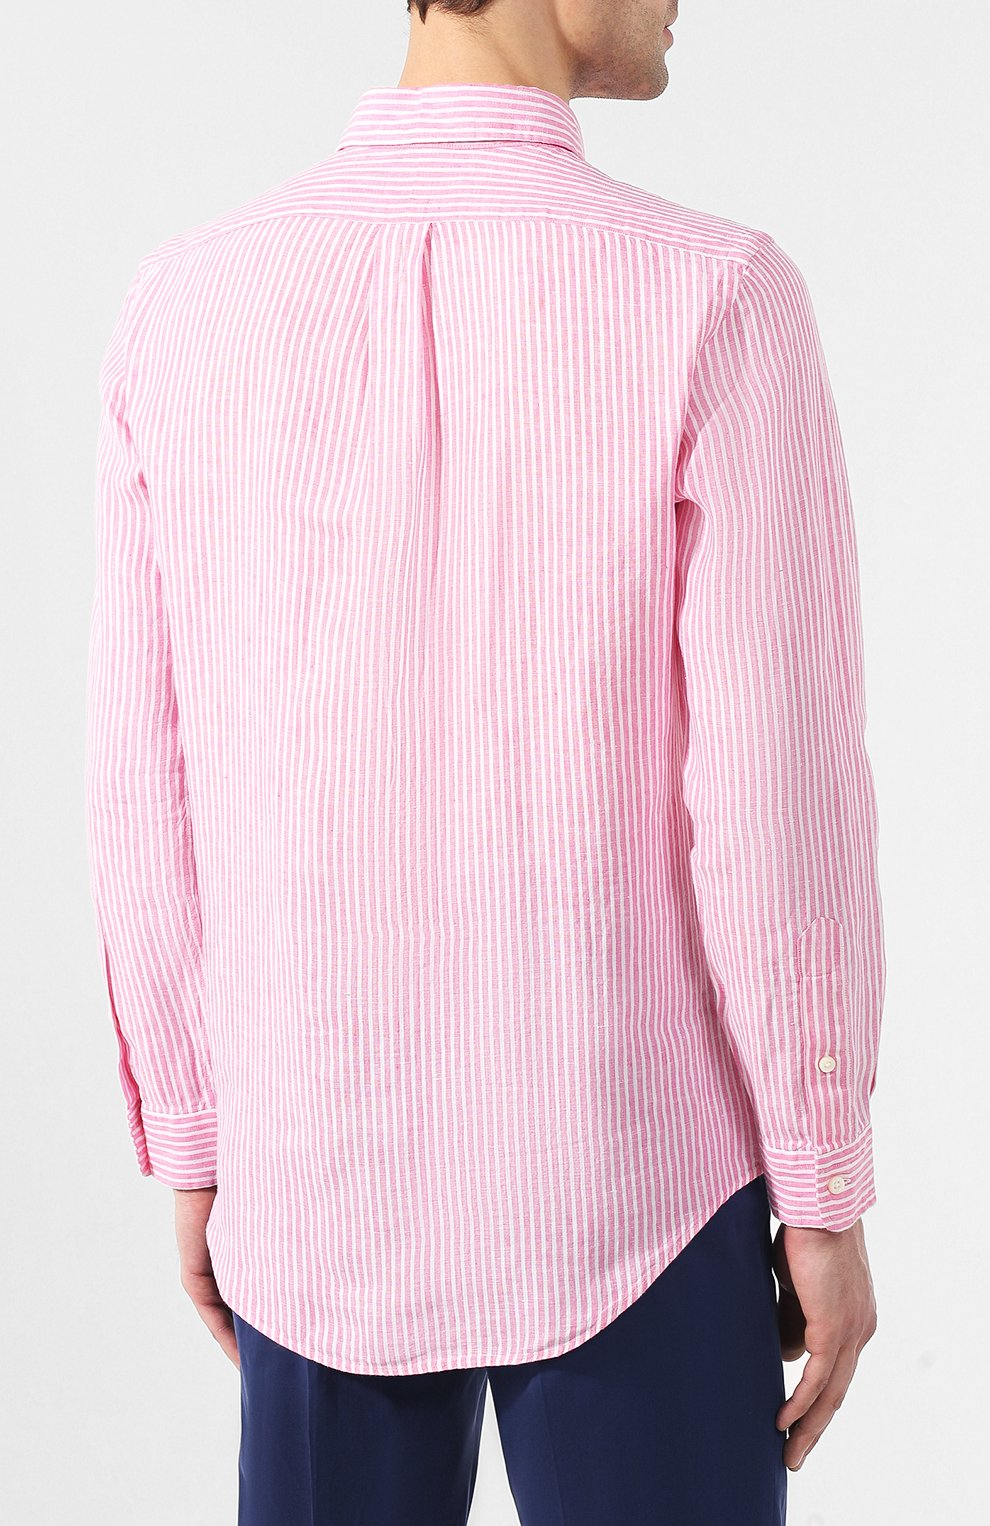 09a3b92051d Мужская розовая льняная рубашка с воротником button down POLO RALPH ...